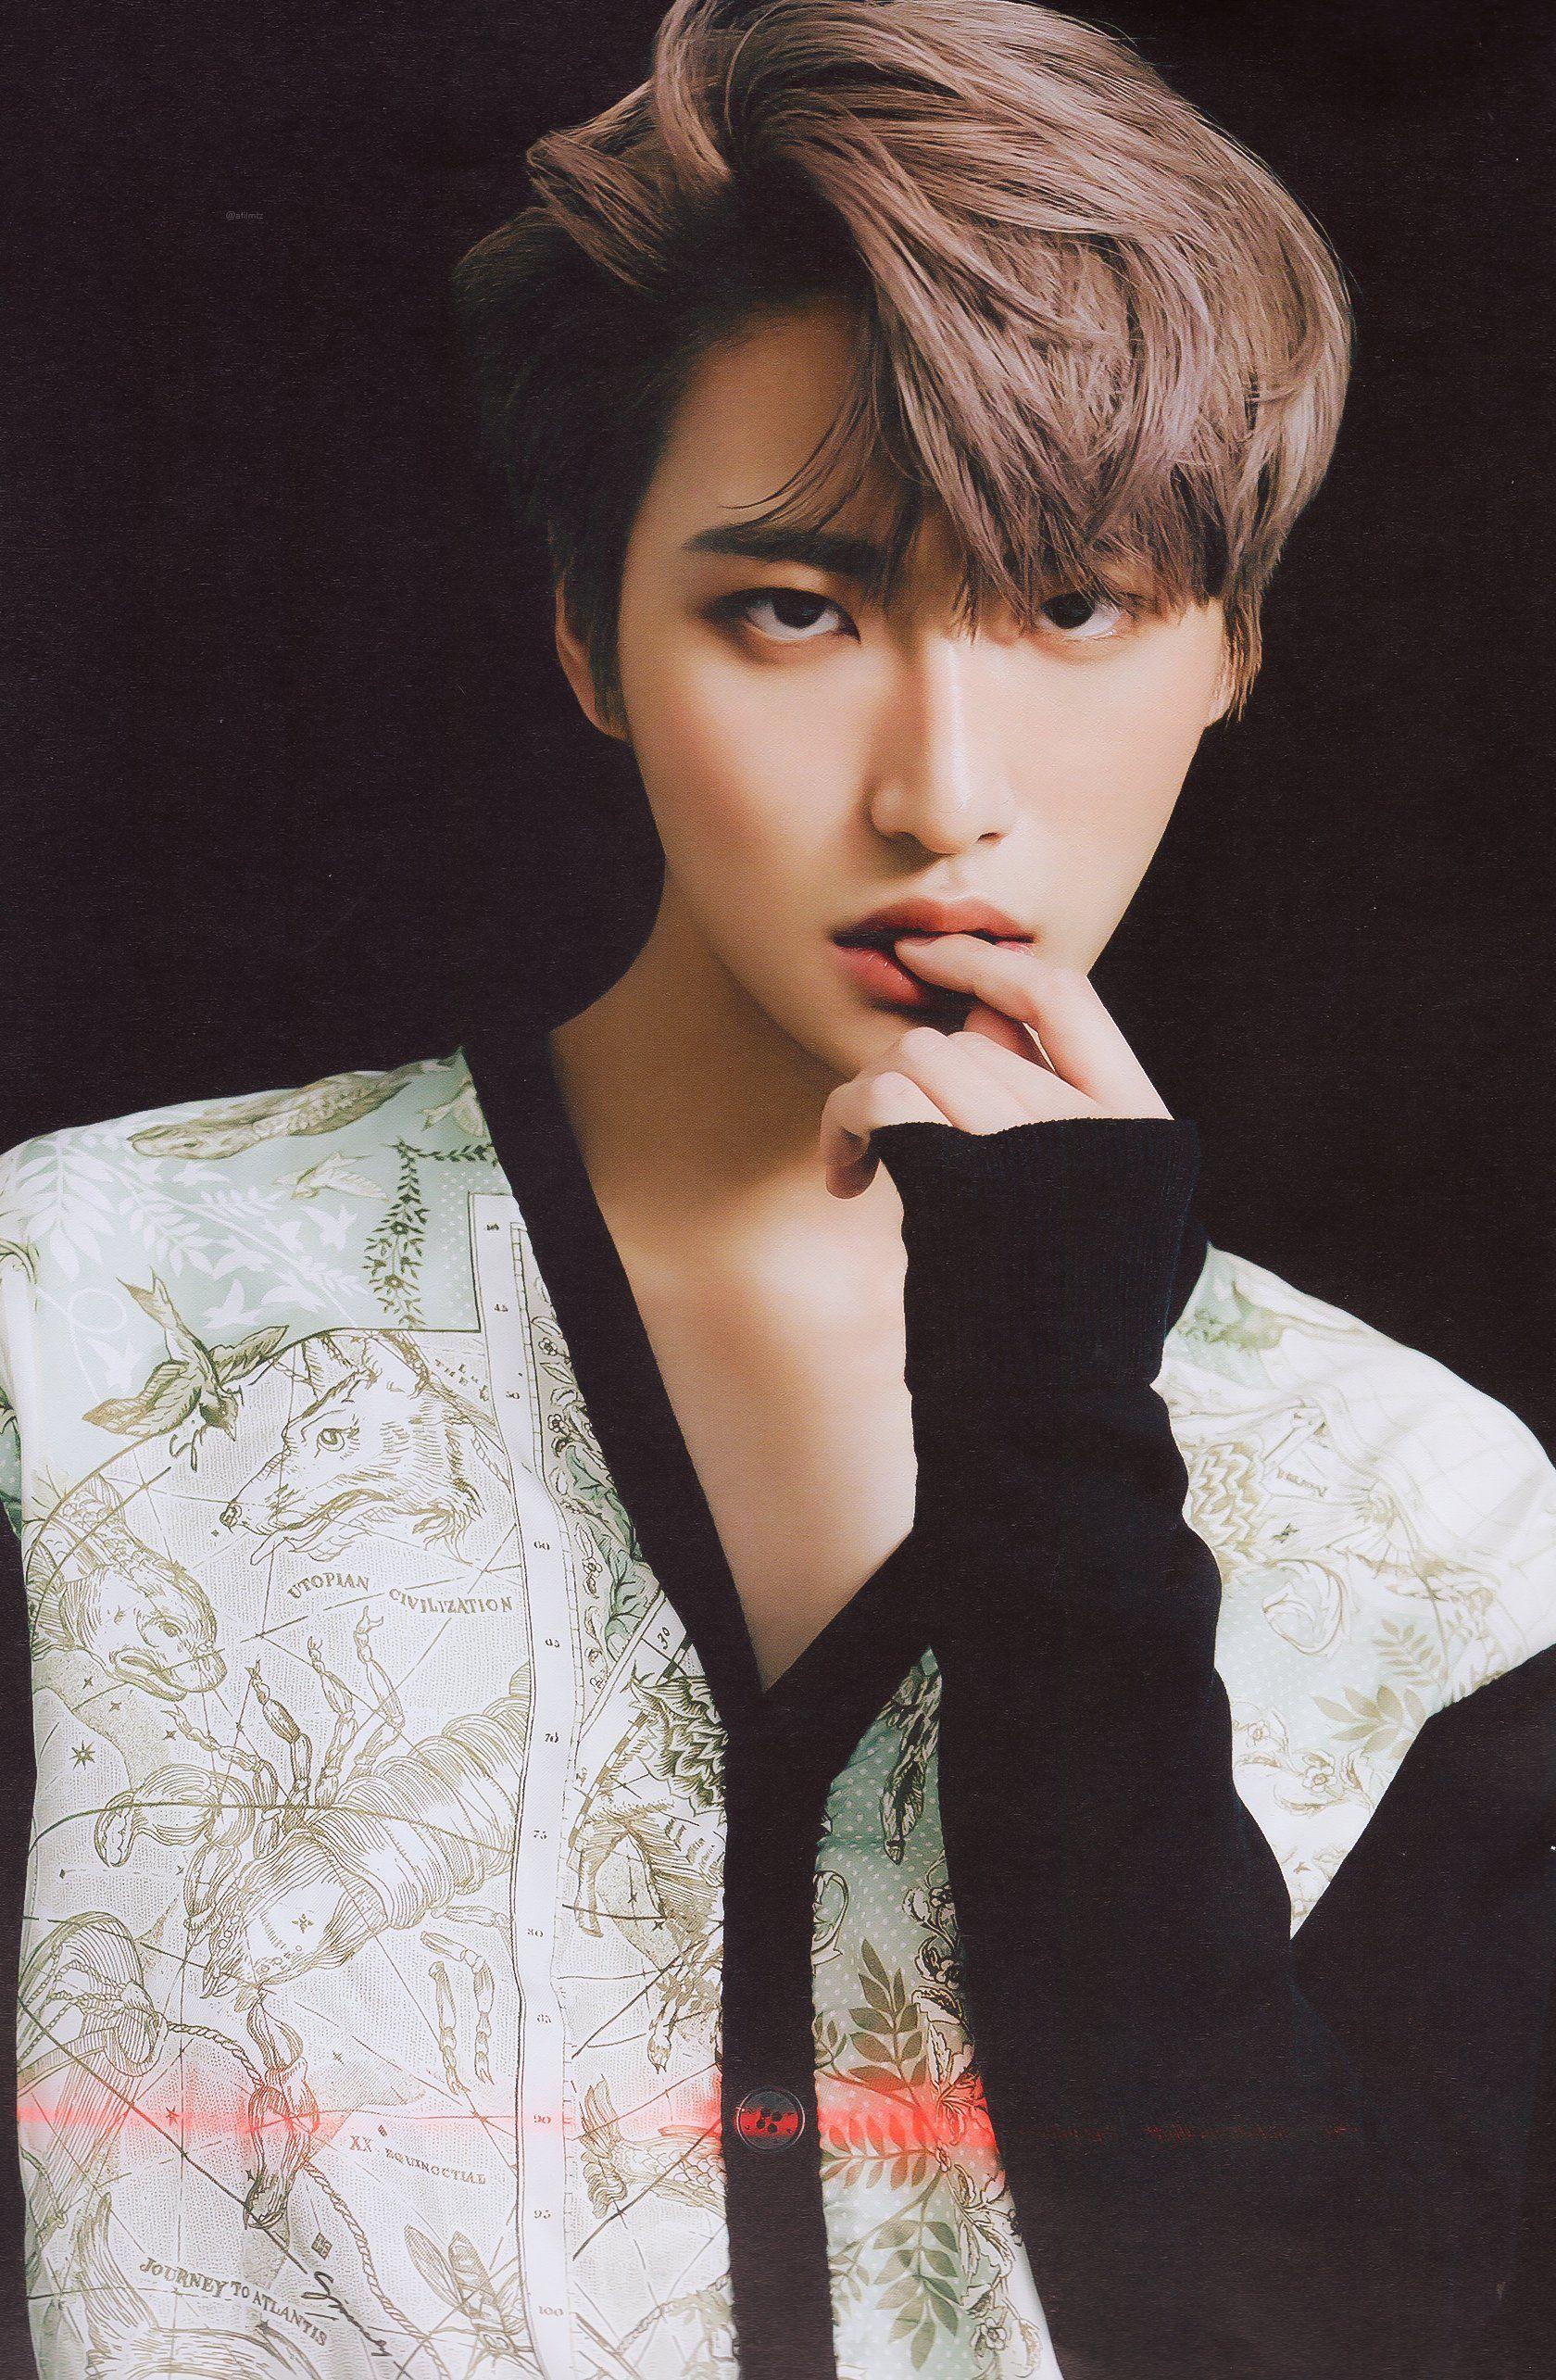 1 Afilmtz Tvitter Star Magazine Pop Group Kpop Idol